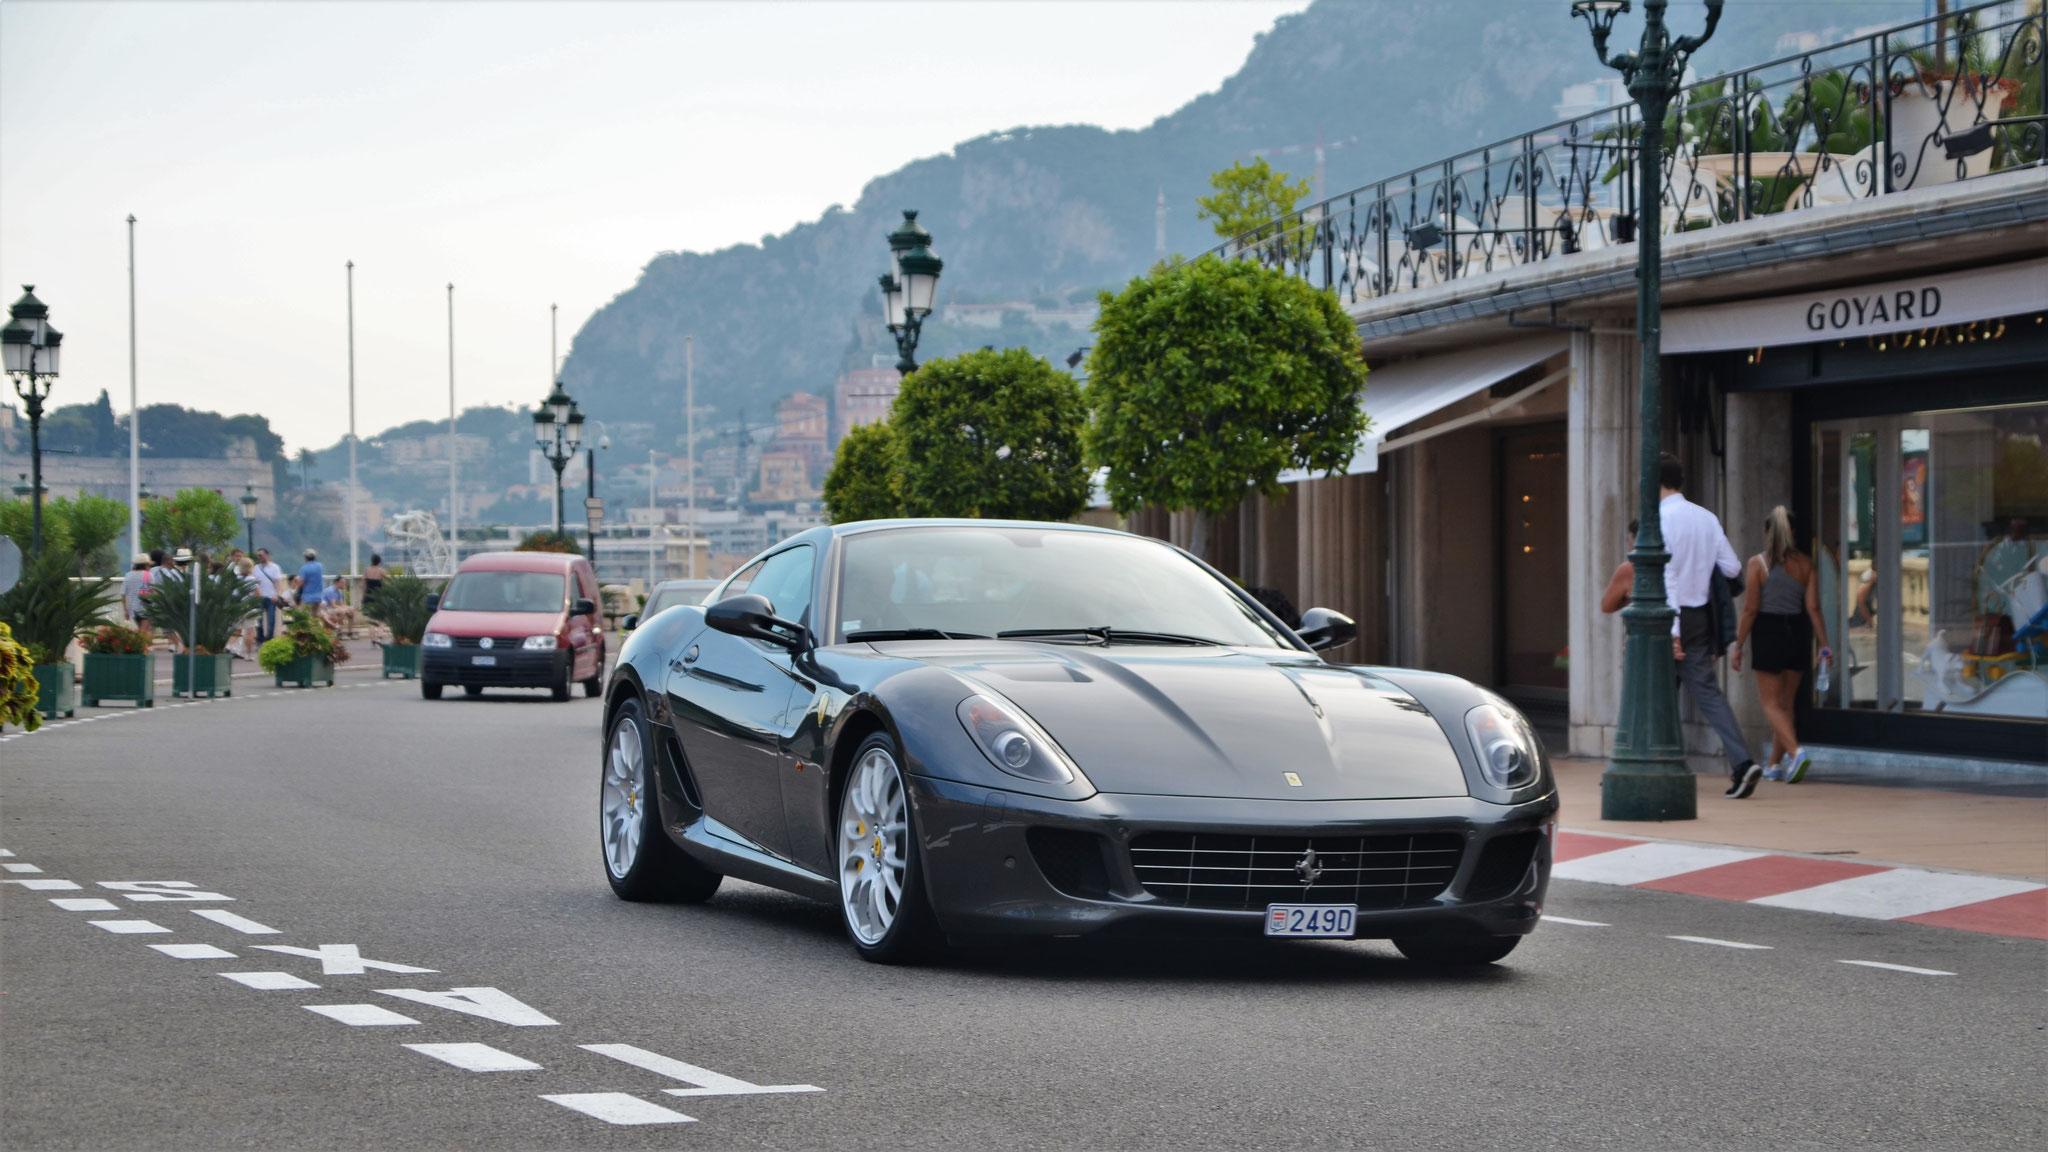 Ferrari 599 GTB - 2490 (MC)